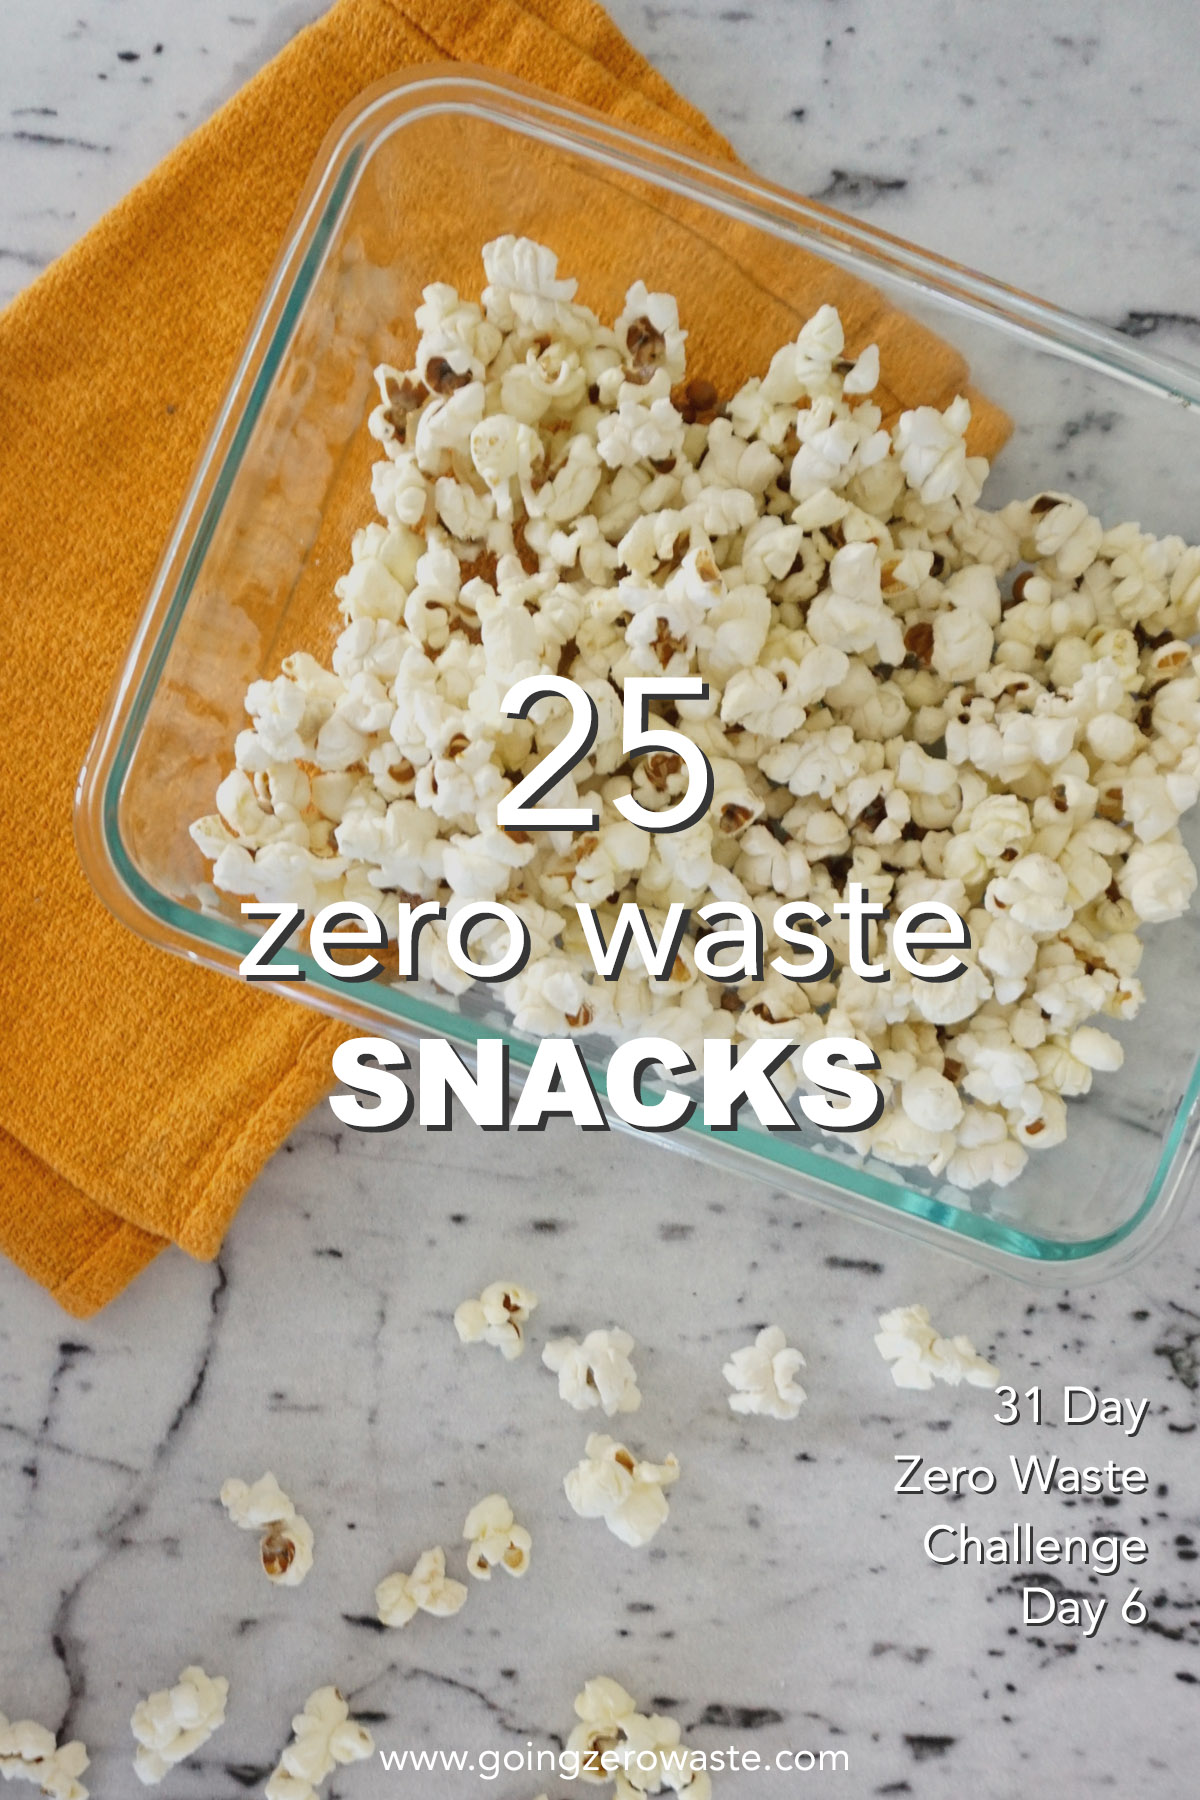 25 zero waste snacks for day seven of the zero waste challenge from www.goingzerowaste.com #ecofriendly #zerowaste #challenge #zerowastesnacks